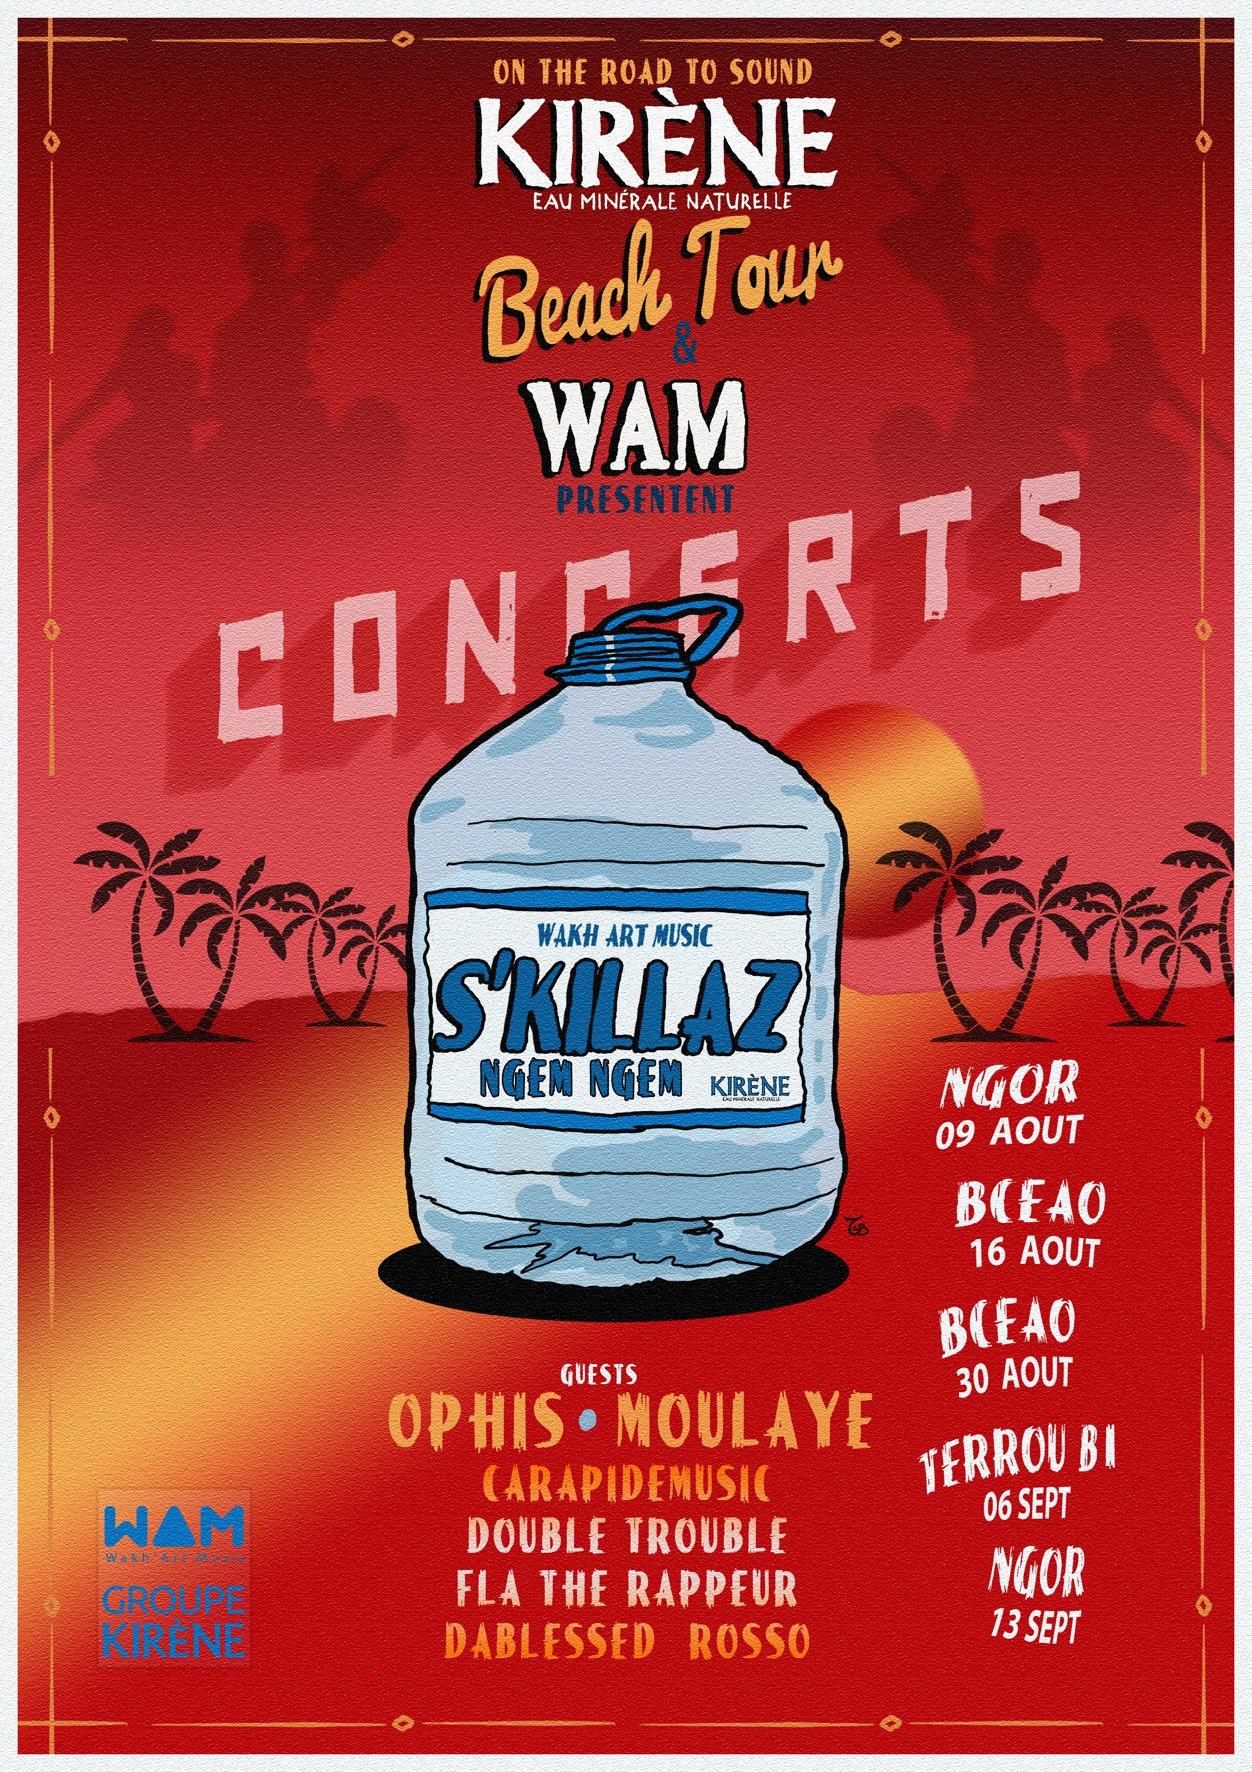 Kirene Beach Tour- S'killaz WAM